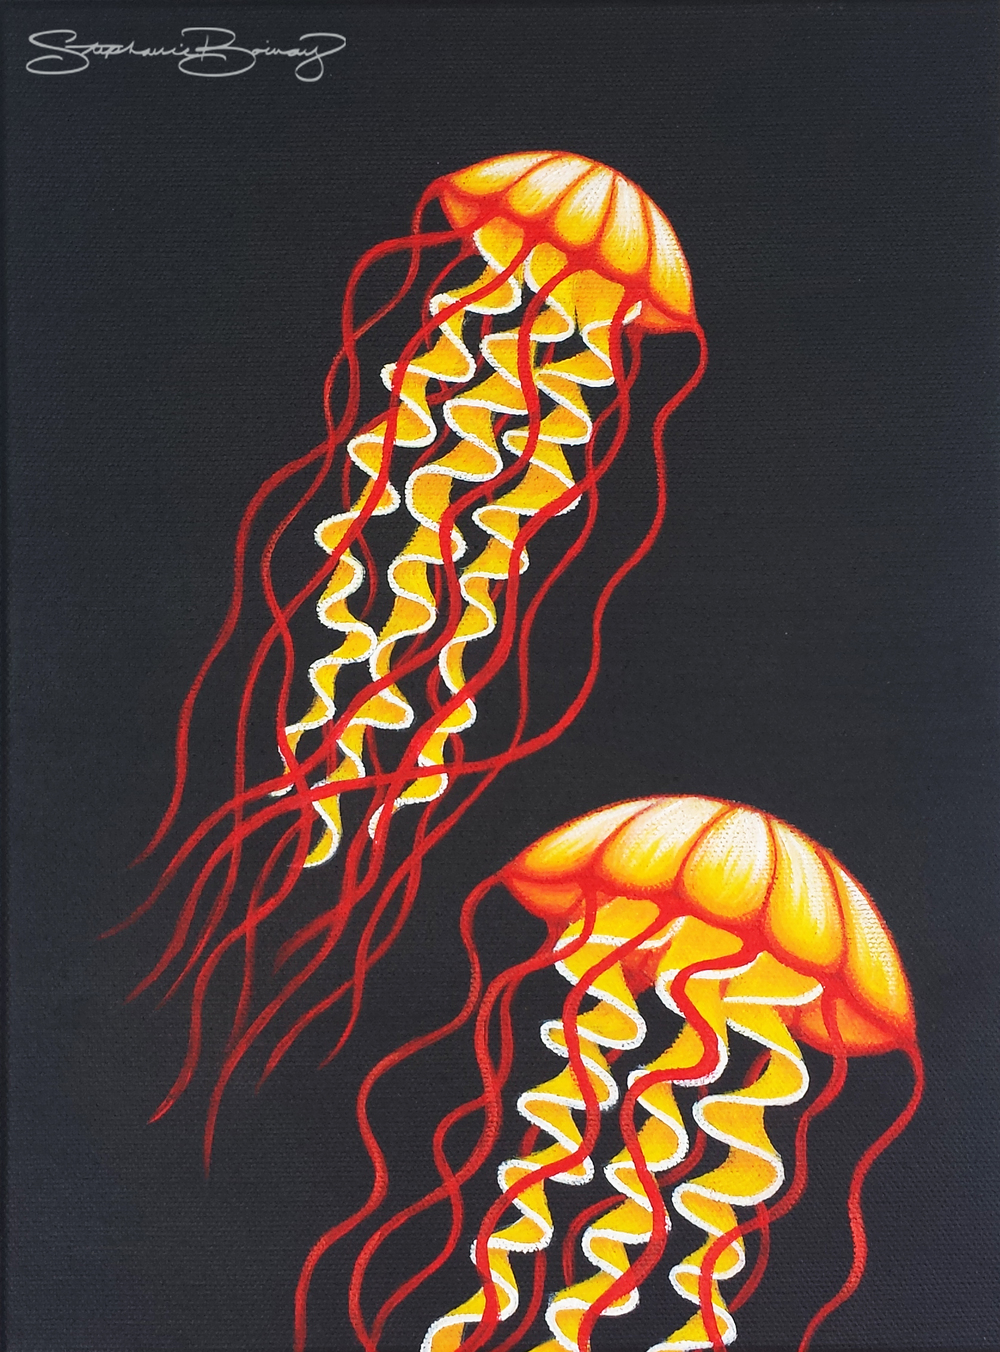 Candycorn Jellyfish